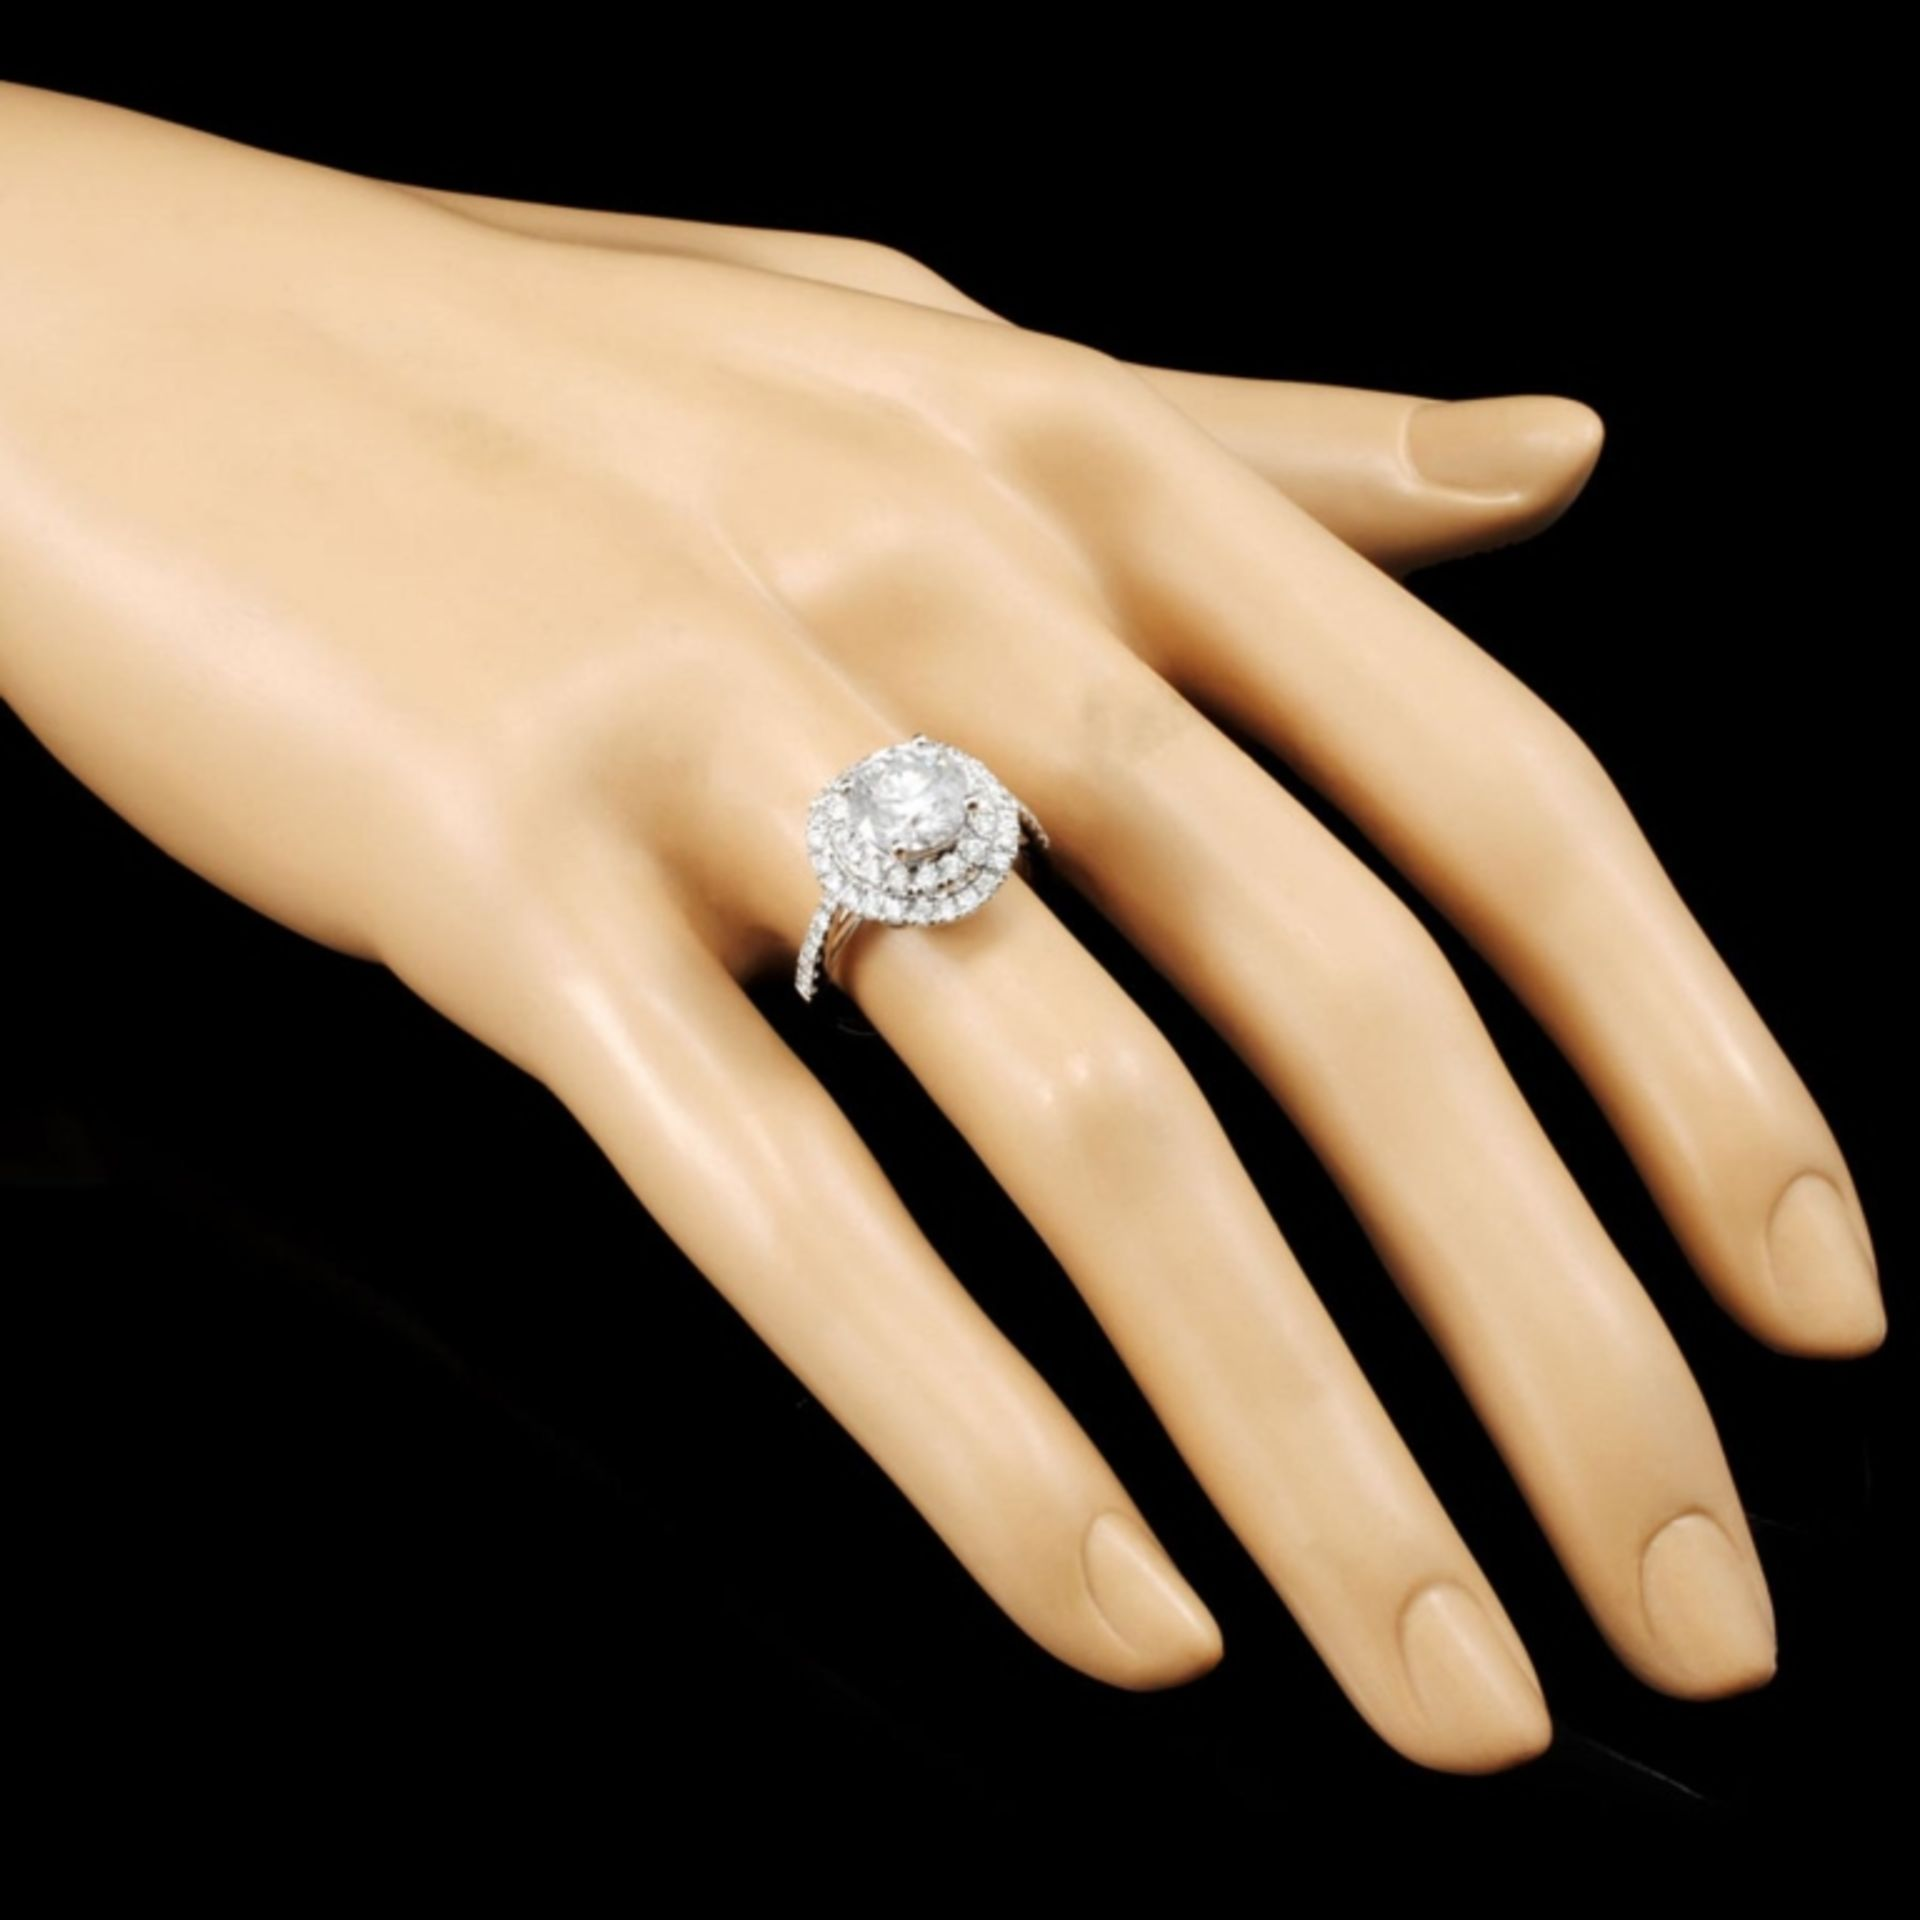 18K Gold 2.73ctw Diamond Ring - Image 5 of 7